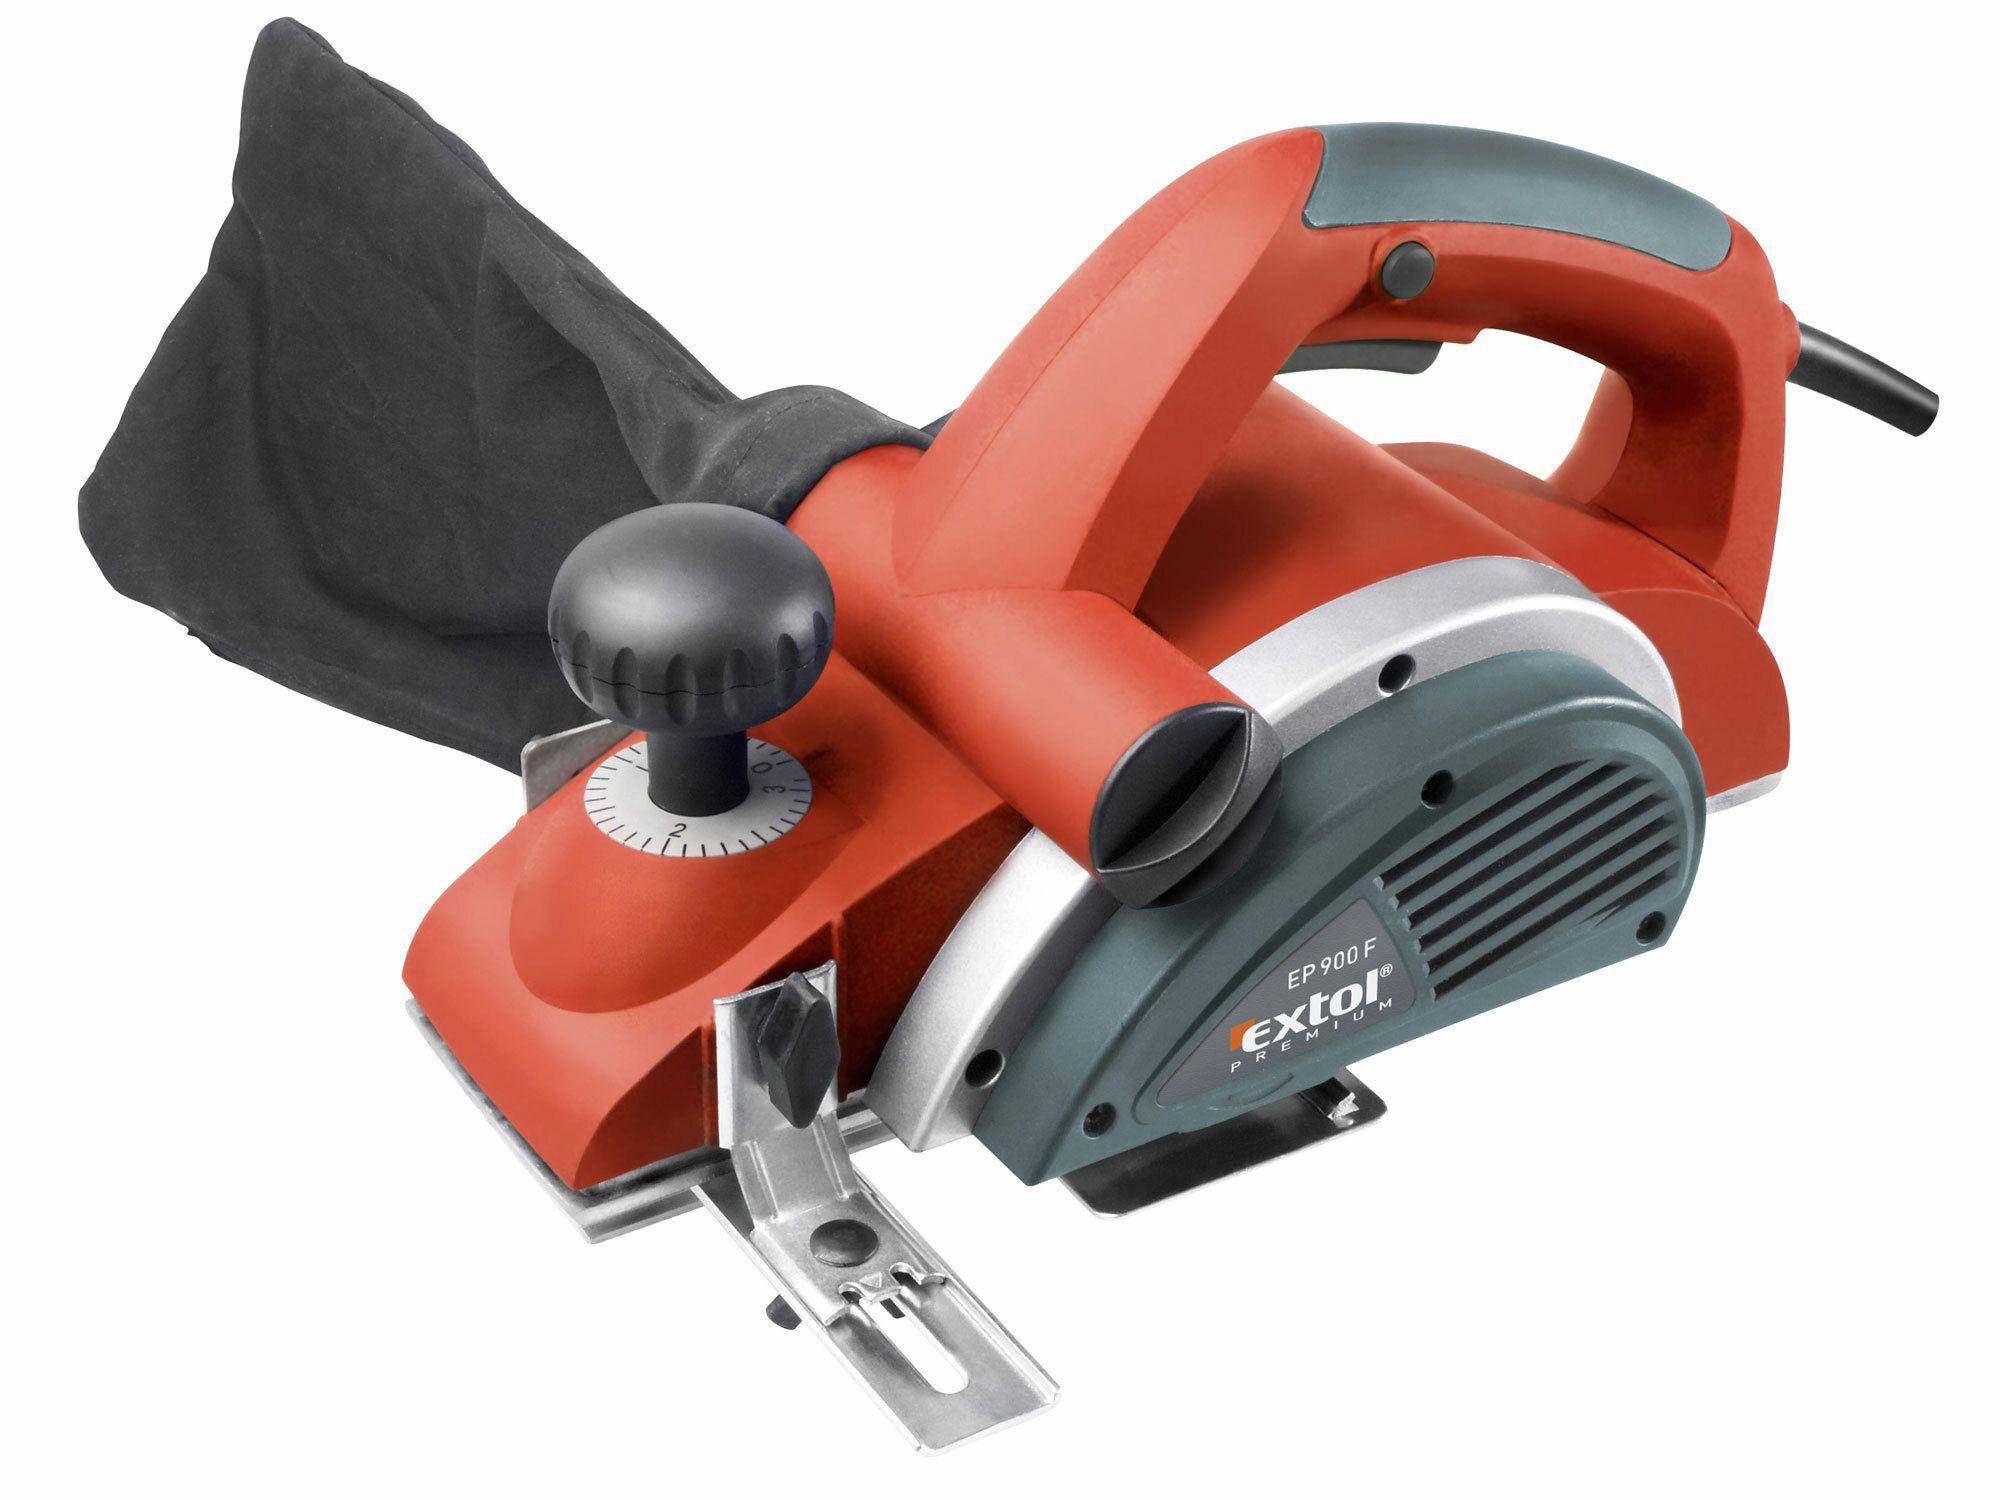 Hoblík elektrický, 900W, 82mm, 0-3mm, EXTOL PREMIUM, EP 900 F, 8893401